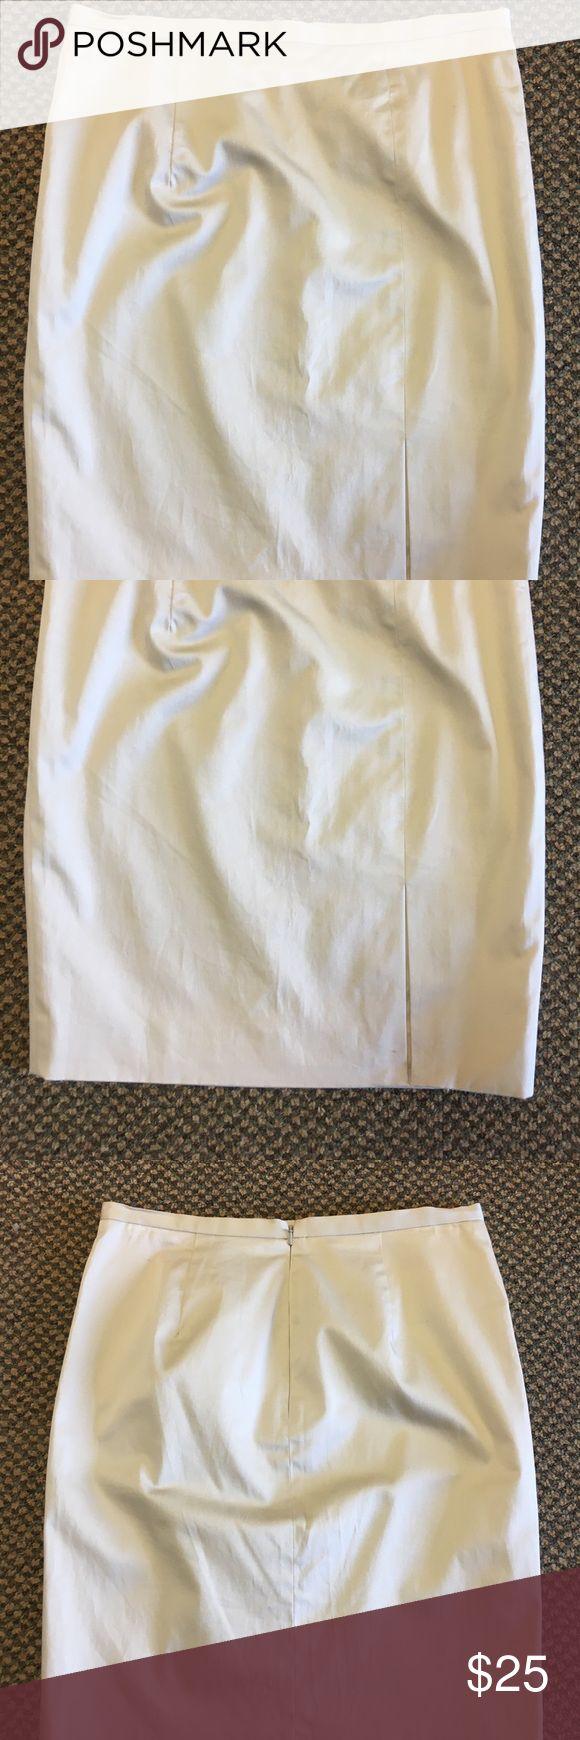 "NWT Michael Kors Khaki Stretch Twill Pencil Skirt Classic cut and lightweight cotton Blend with front slit up left thigh (still sewn closed). Back zipper. No pockets. 30"" waist 34"" hips 21"" long. MICHAEL Michael Kors Skirts Pencil"